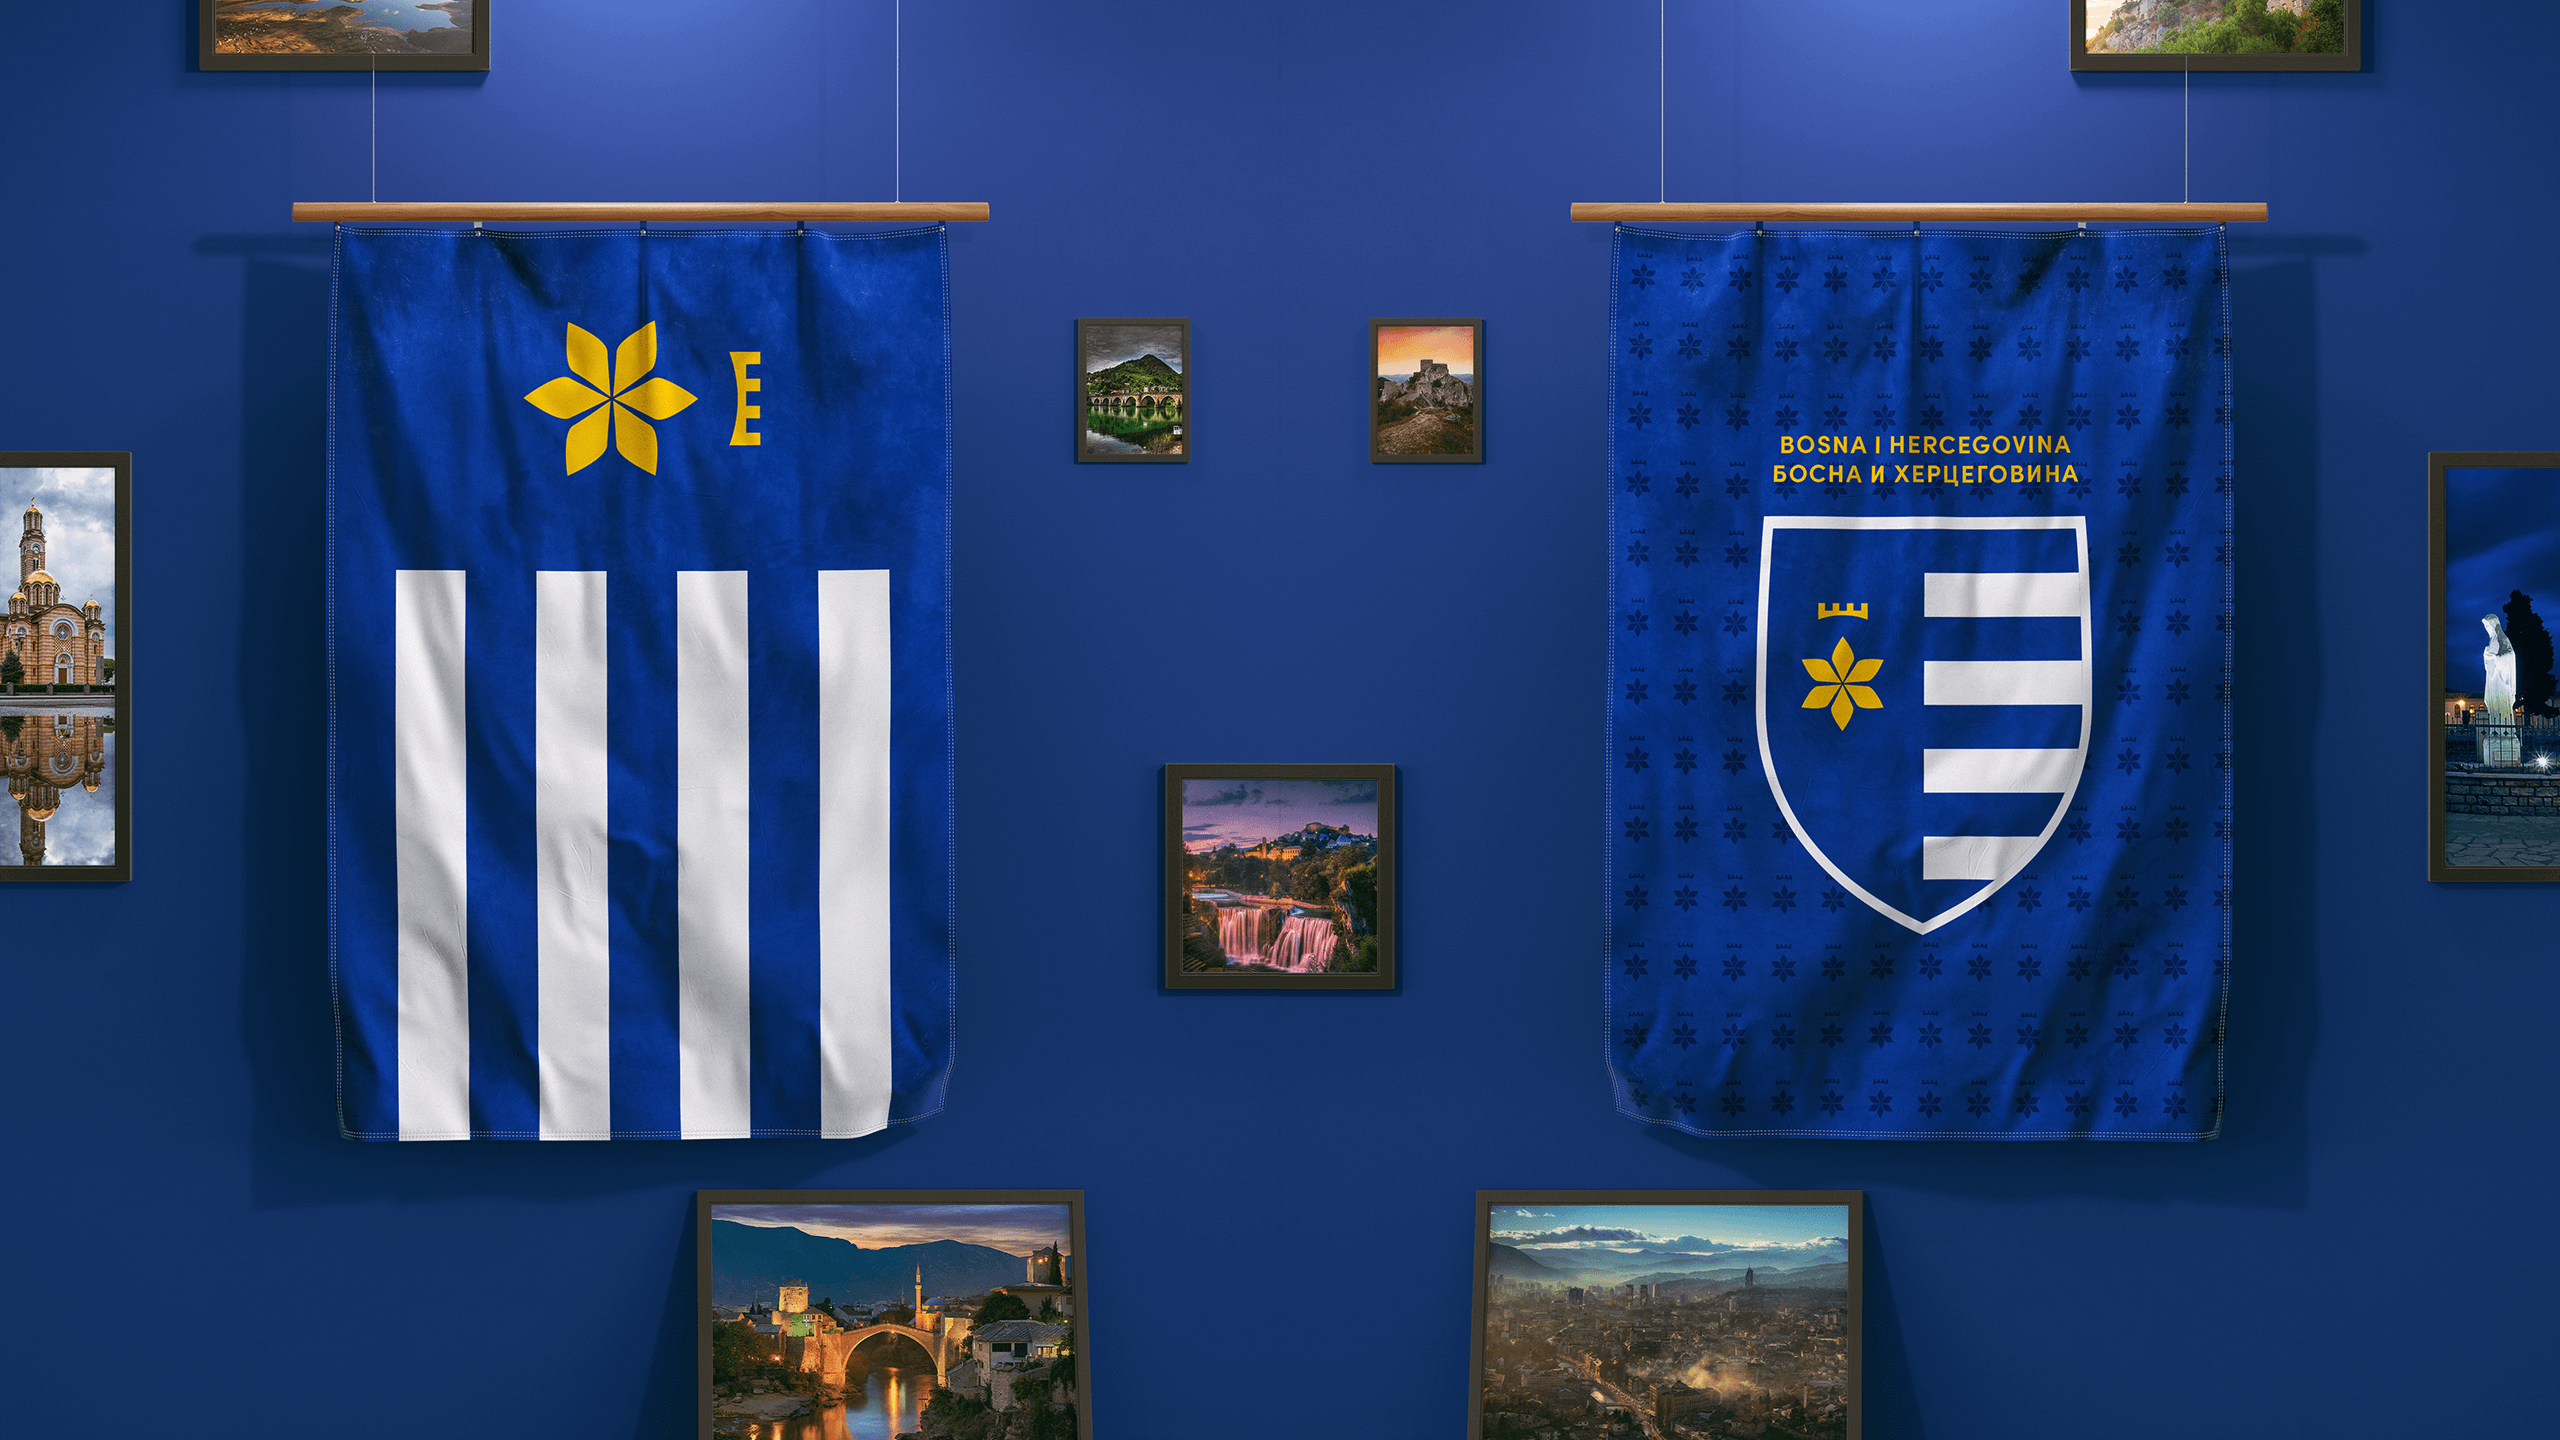 heysuho-denissuhopoljac-bih-flag-2019-featured-image